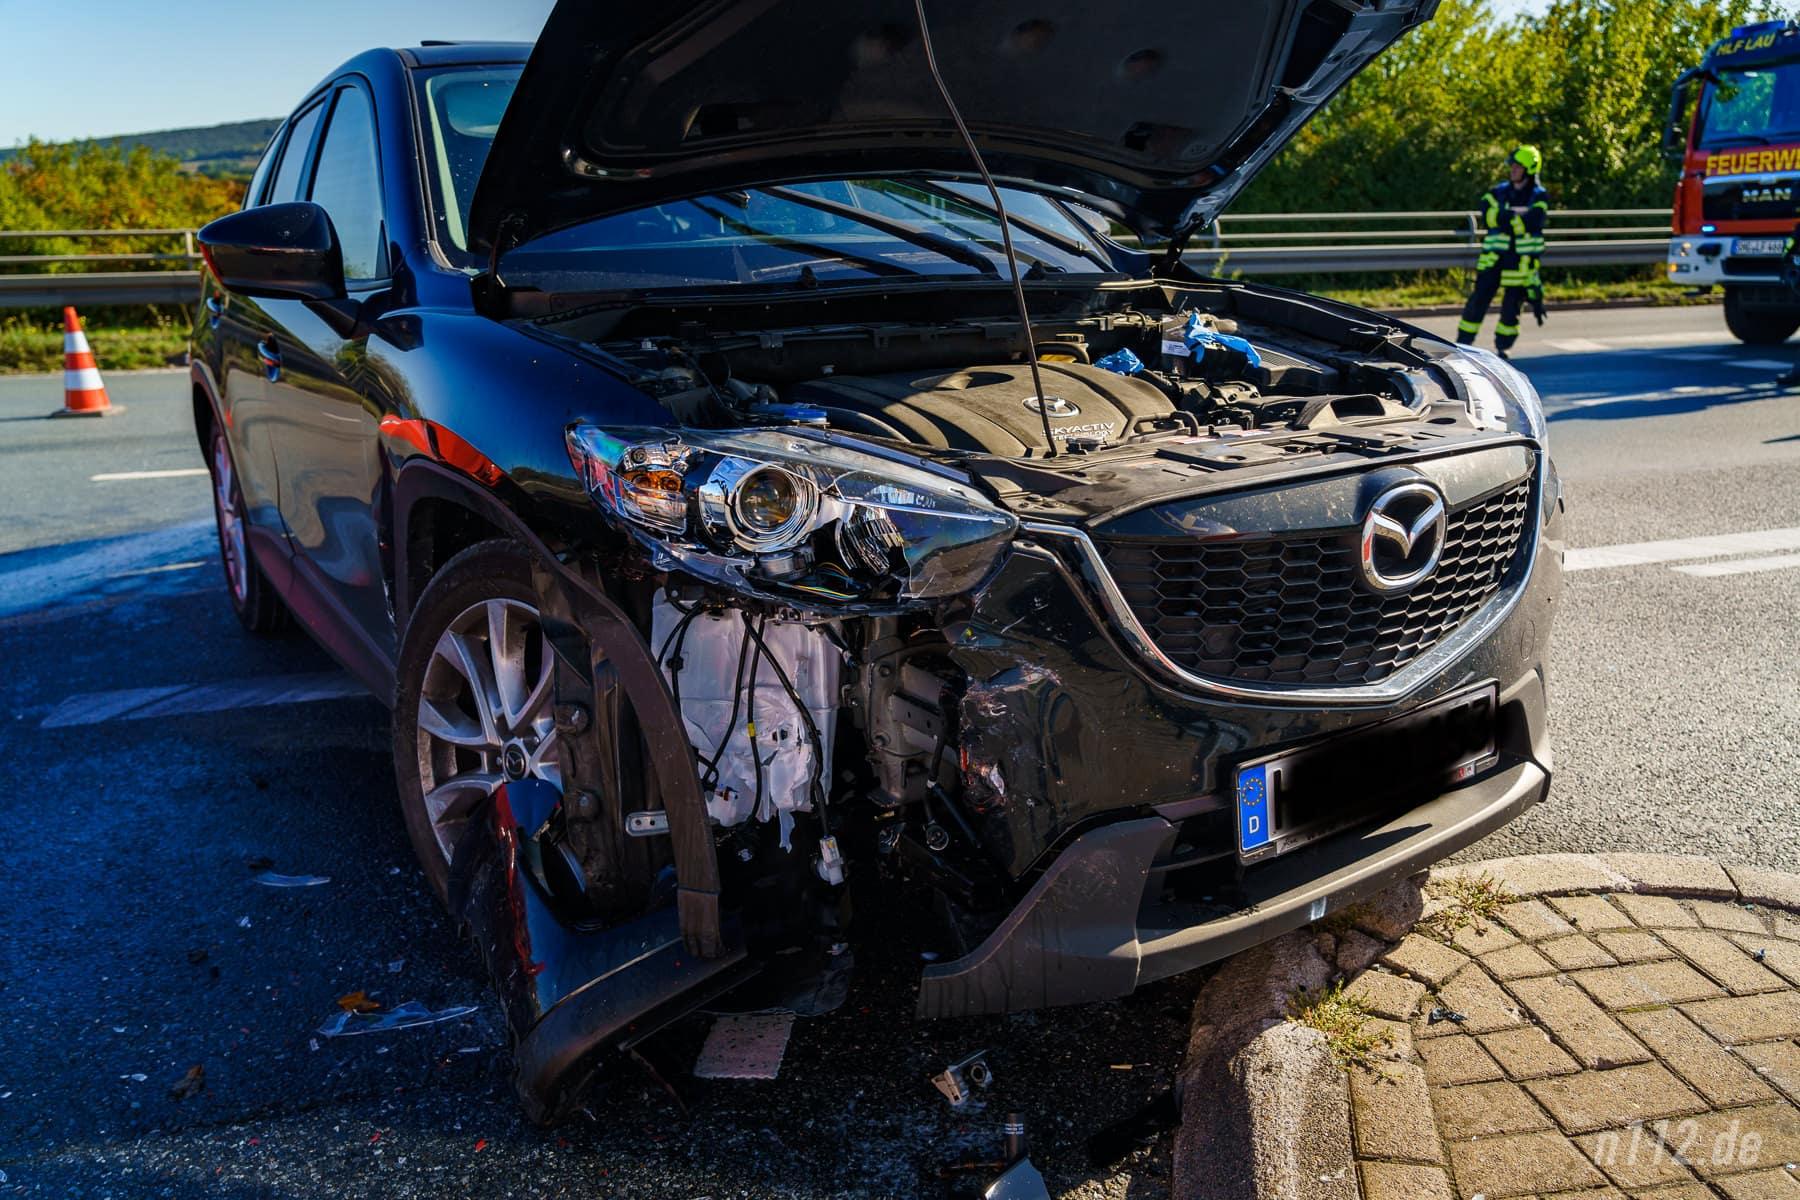 Verhältnismäßig gering beschädigt: Das SUV des Verursachers (Foto: n112.de/Stefan Simonsen)